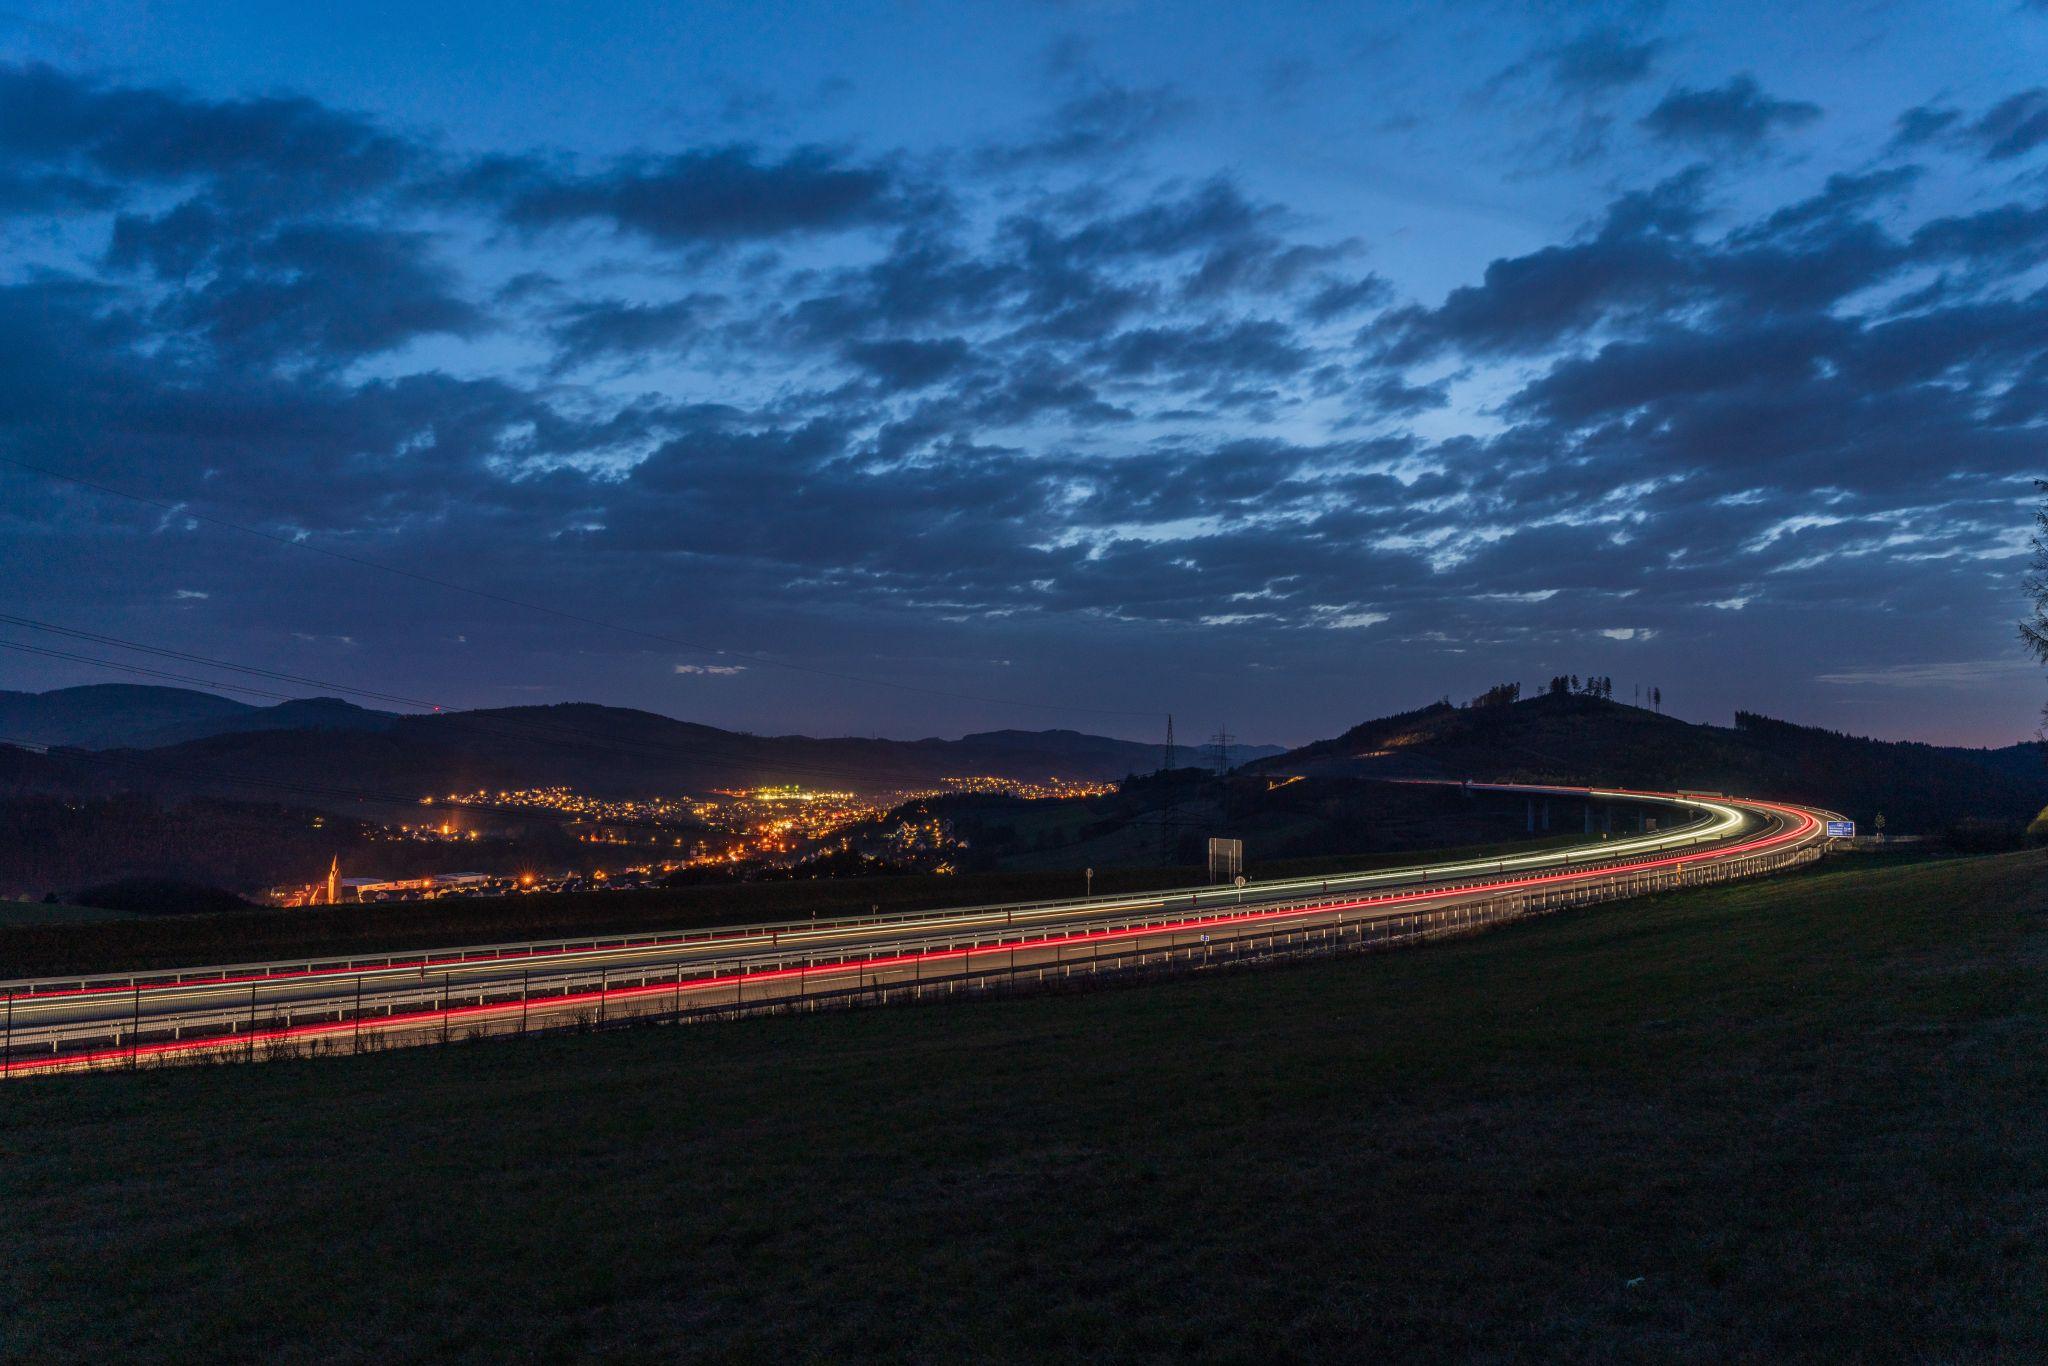 Highway near Nuttlar (Sauerland), Germany, Germany